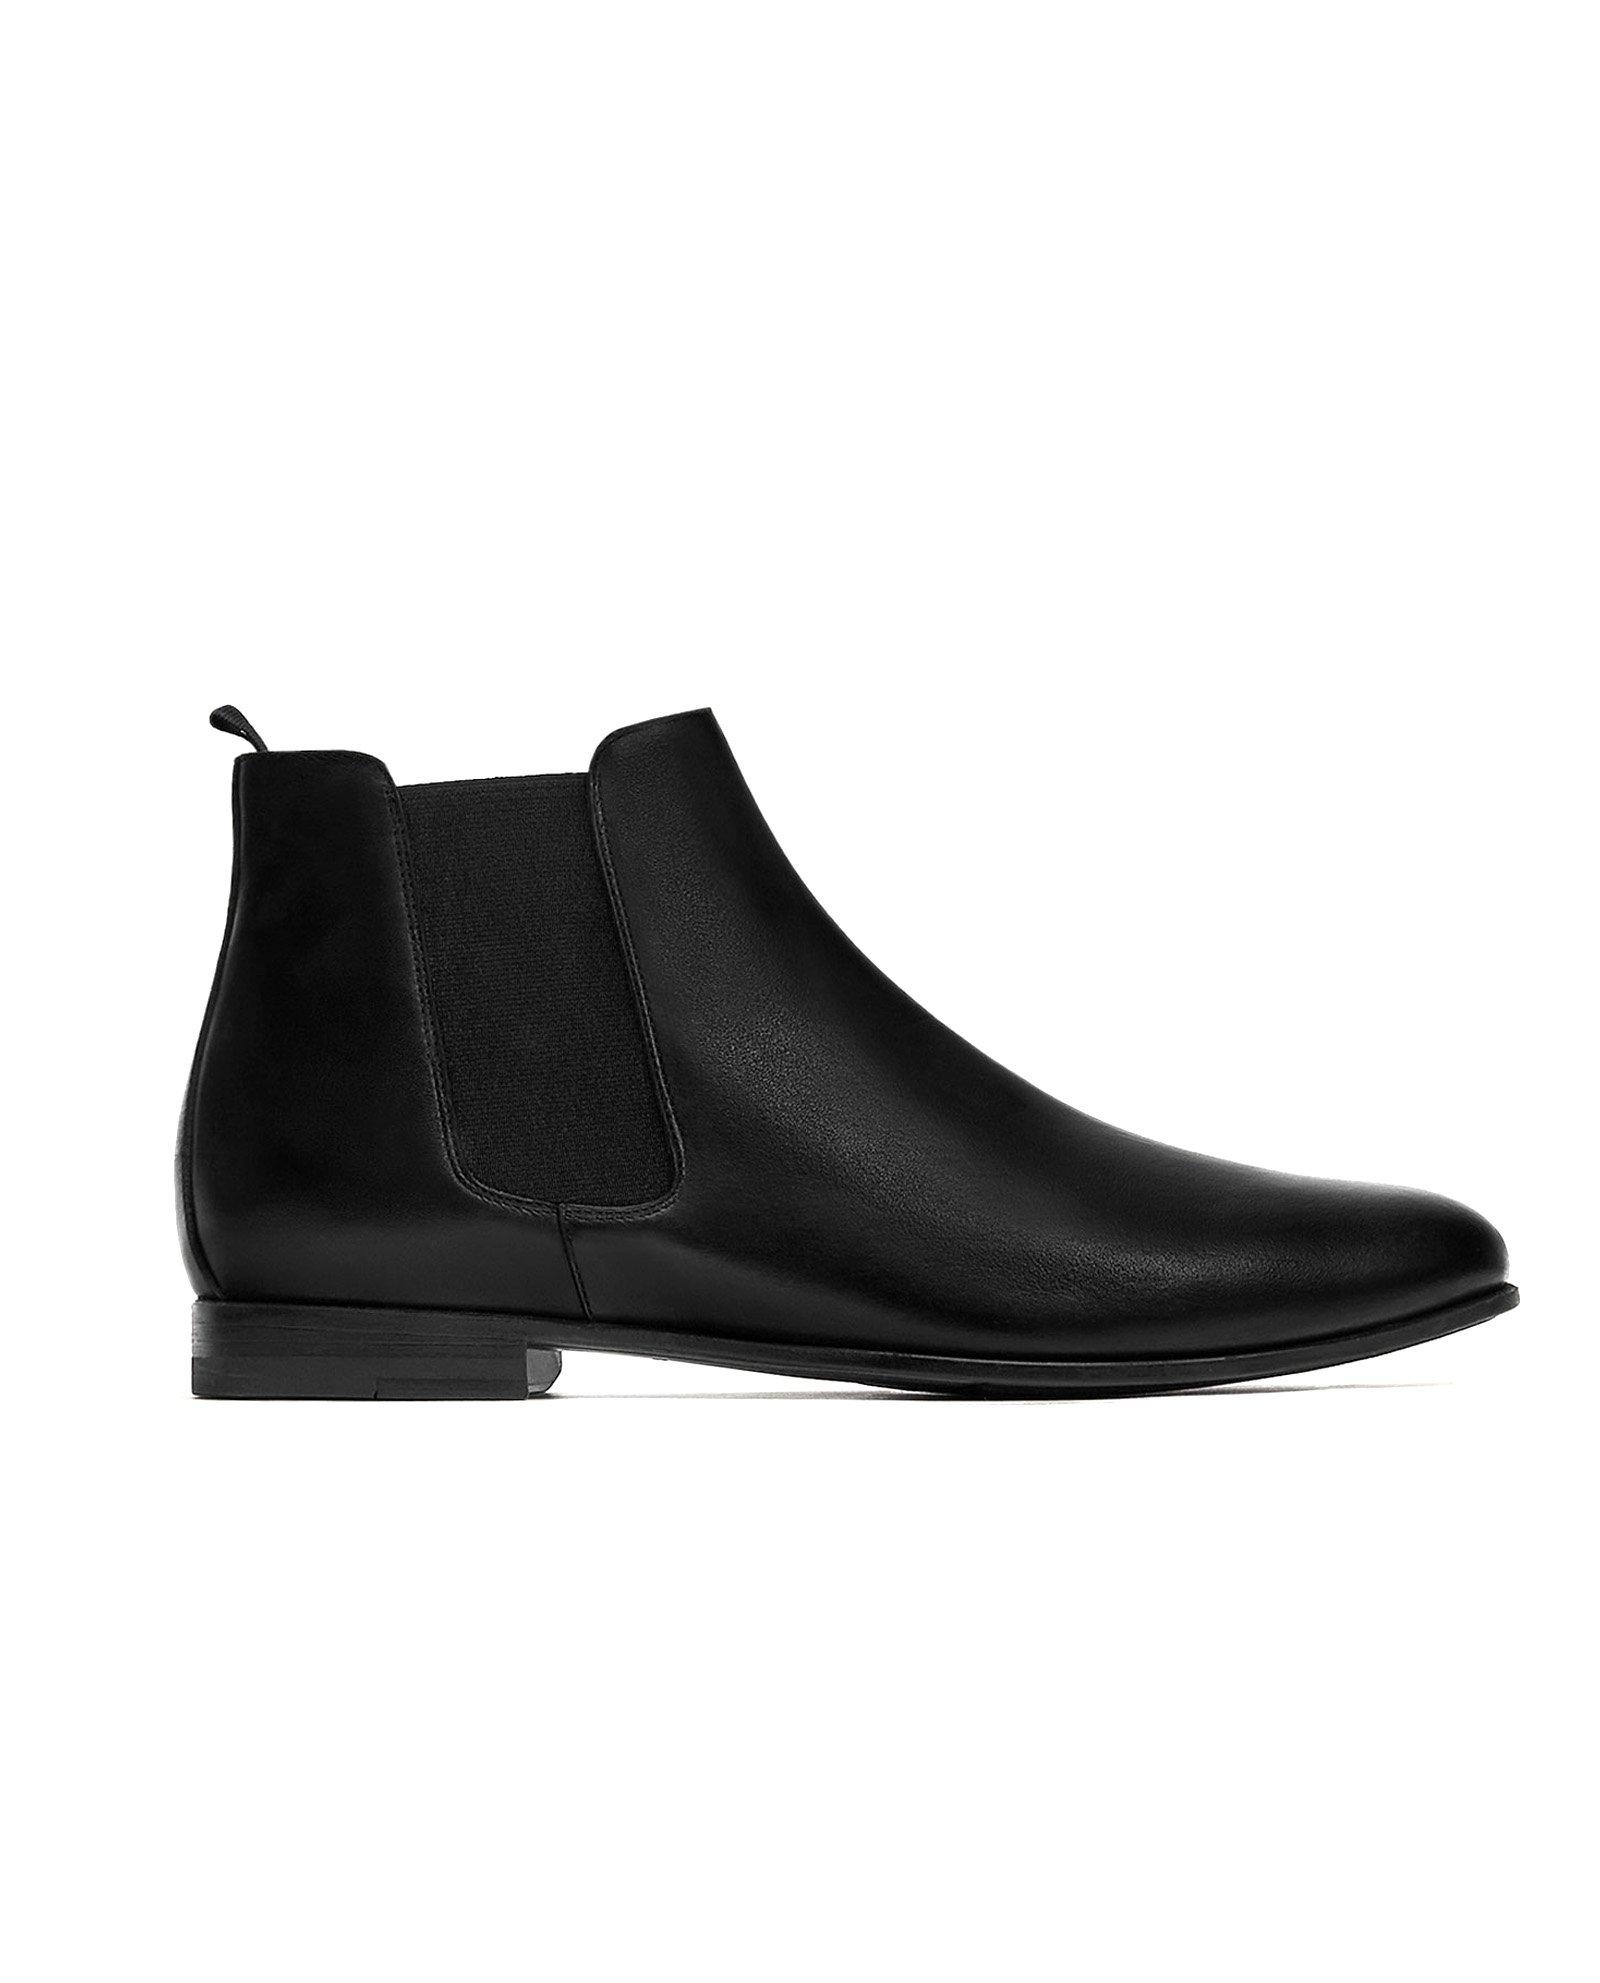 Zara Men Leather ankle boots 5601/202 (43 EU   10 US   9 UK) by Zara